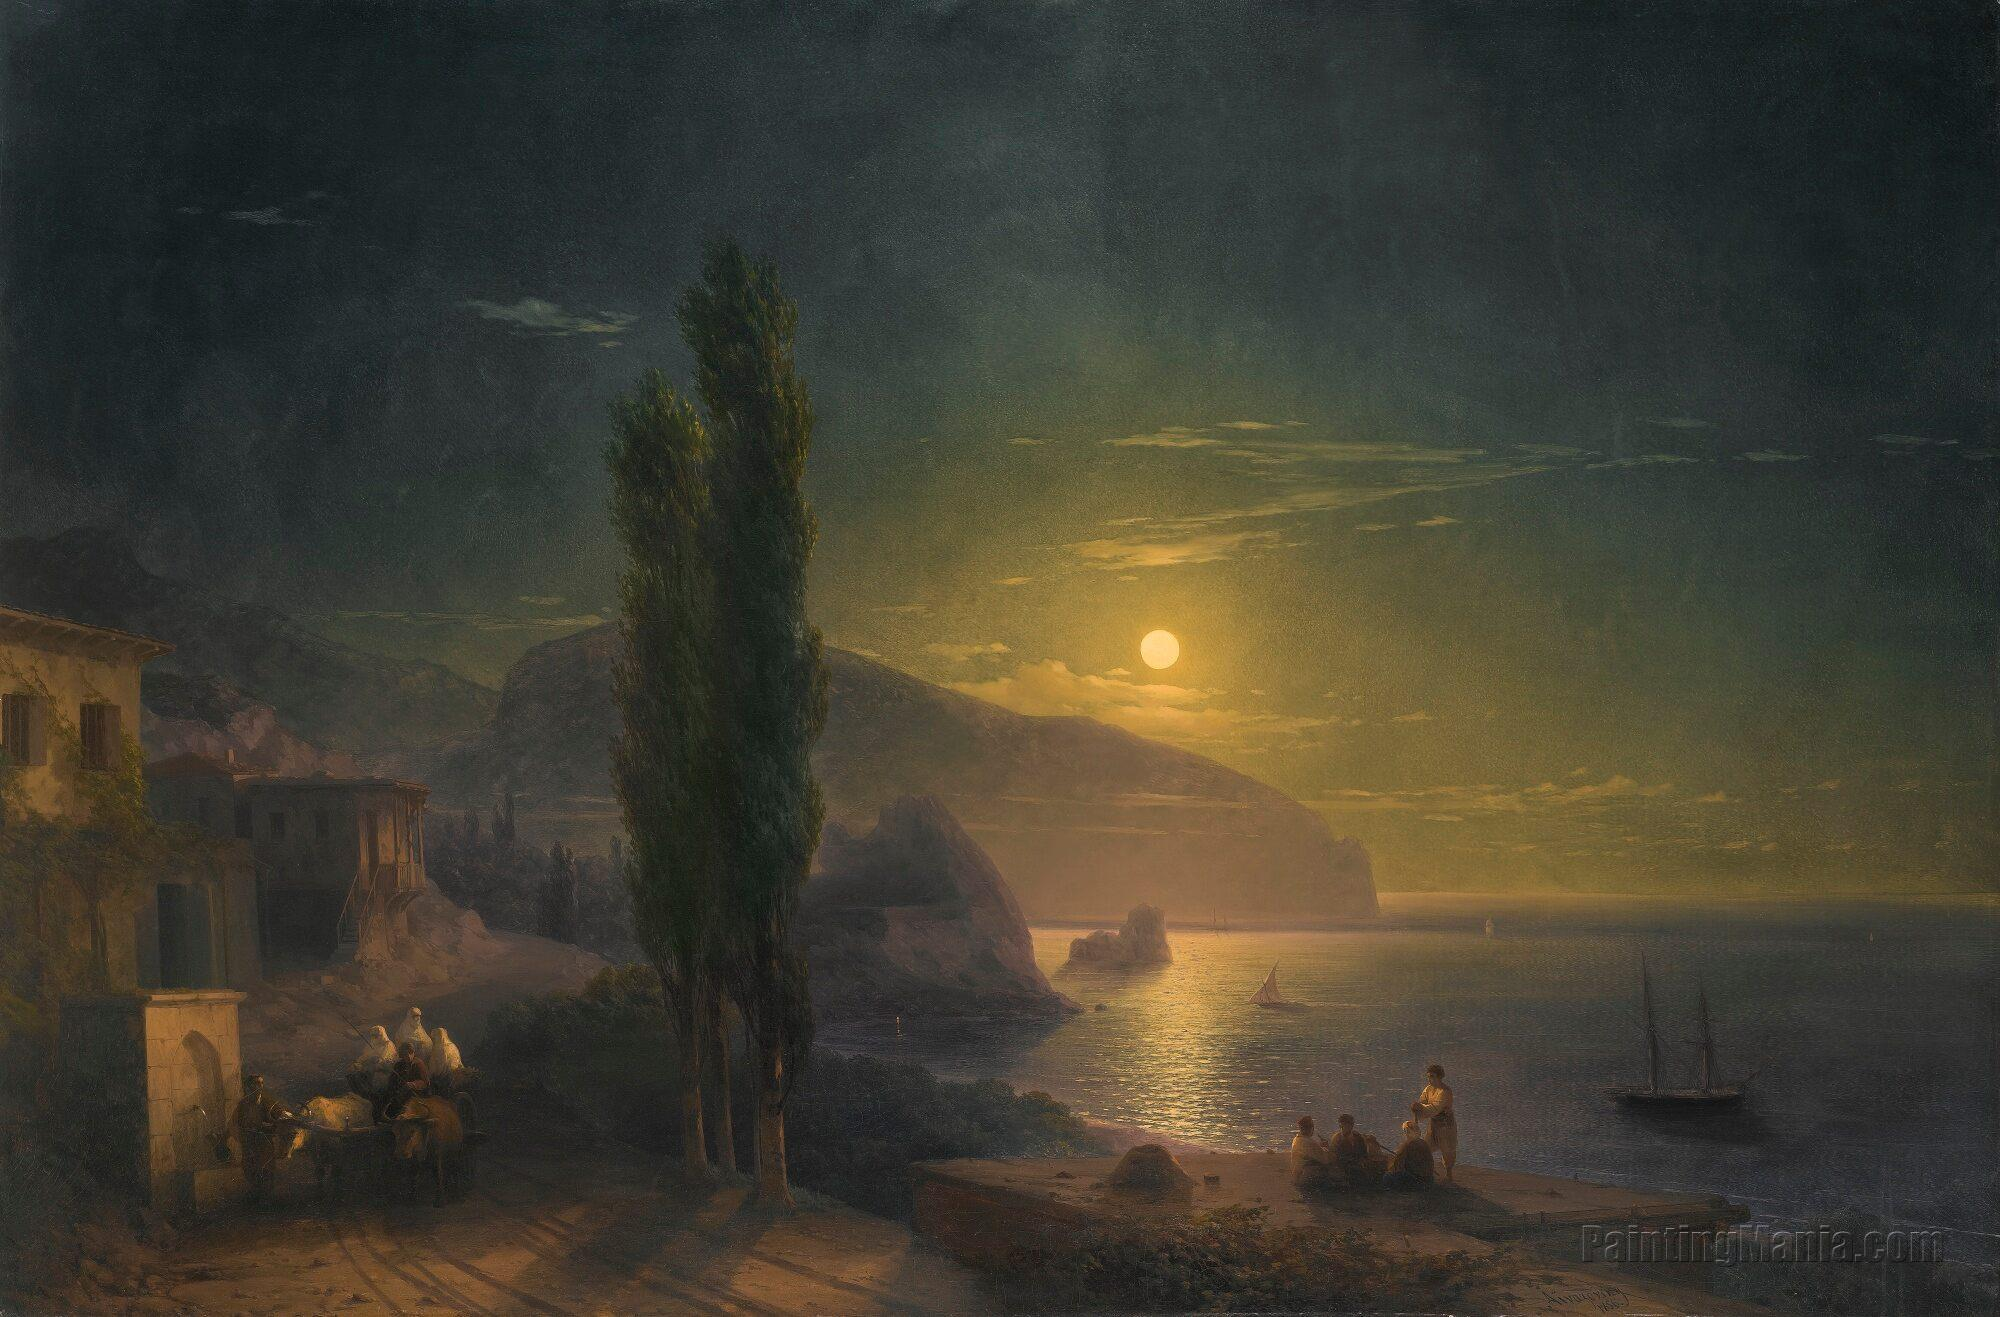 Moonrise over Ayu Dag